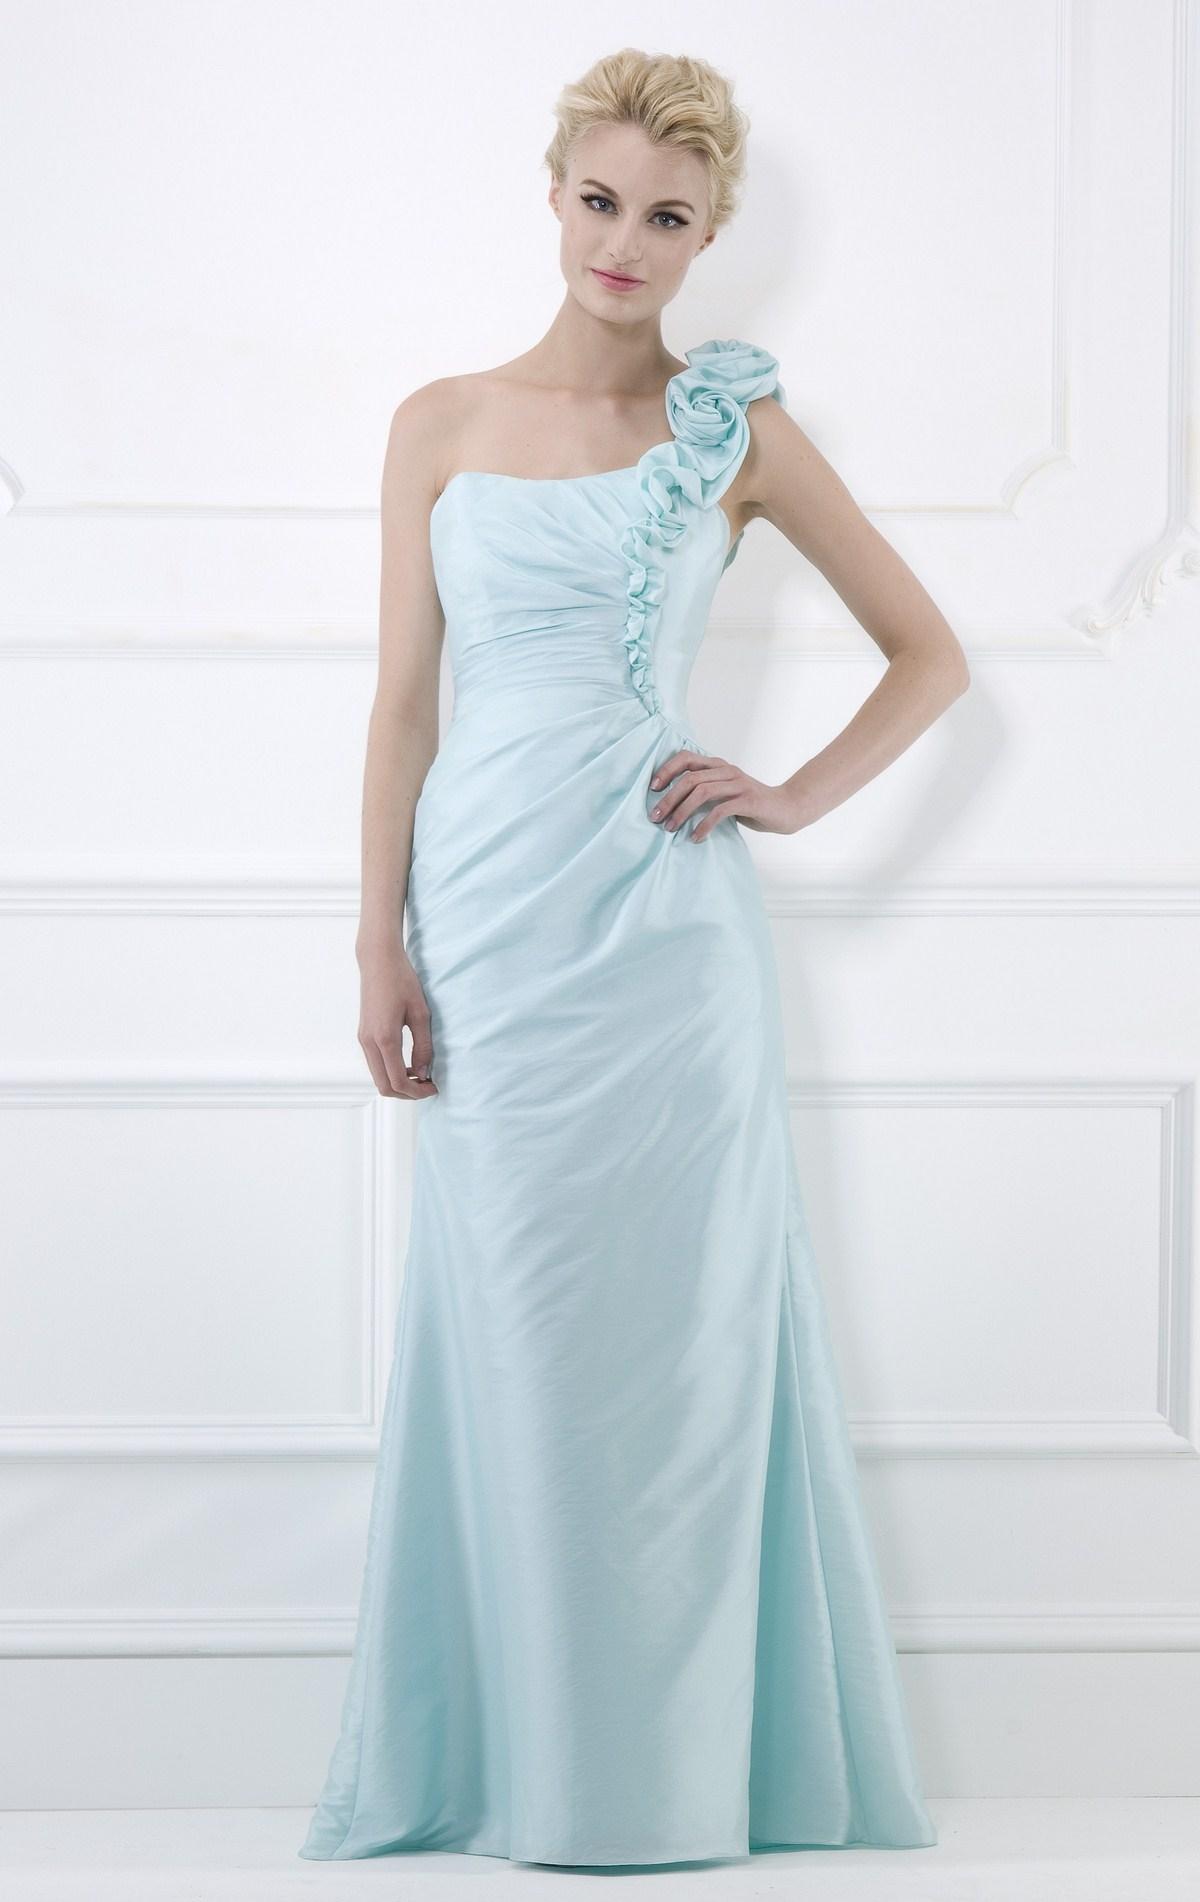 Prom Dresses   vogue dreaming